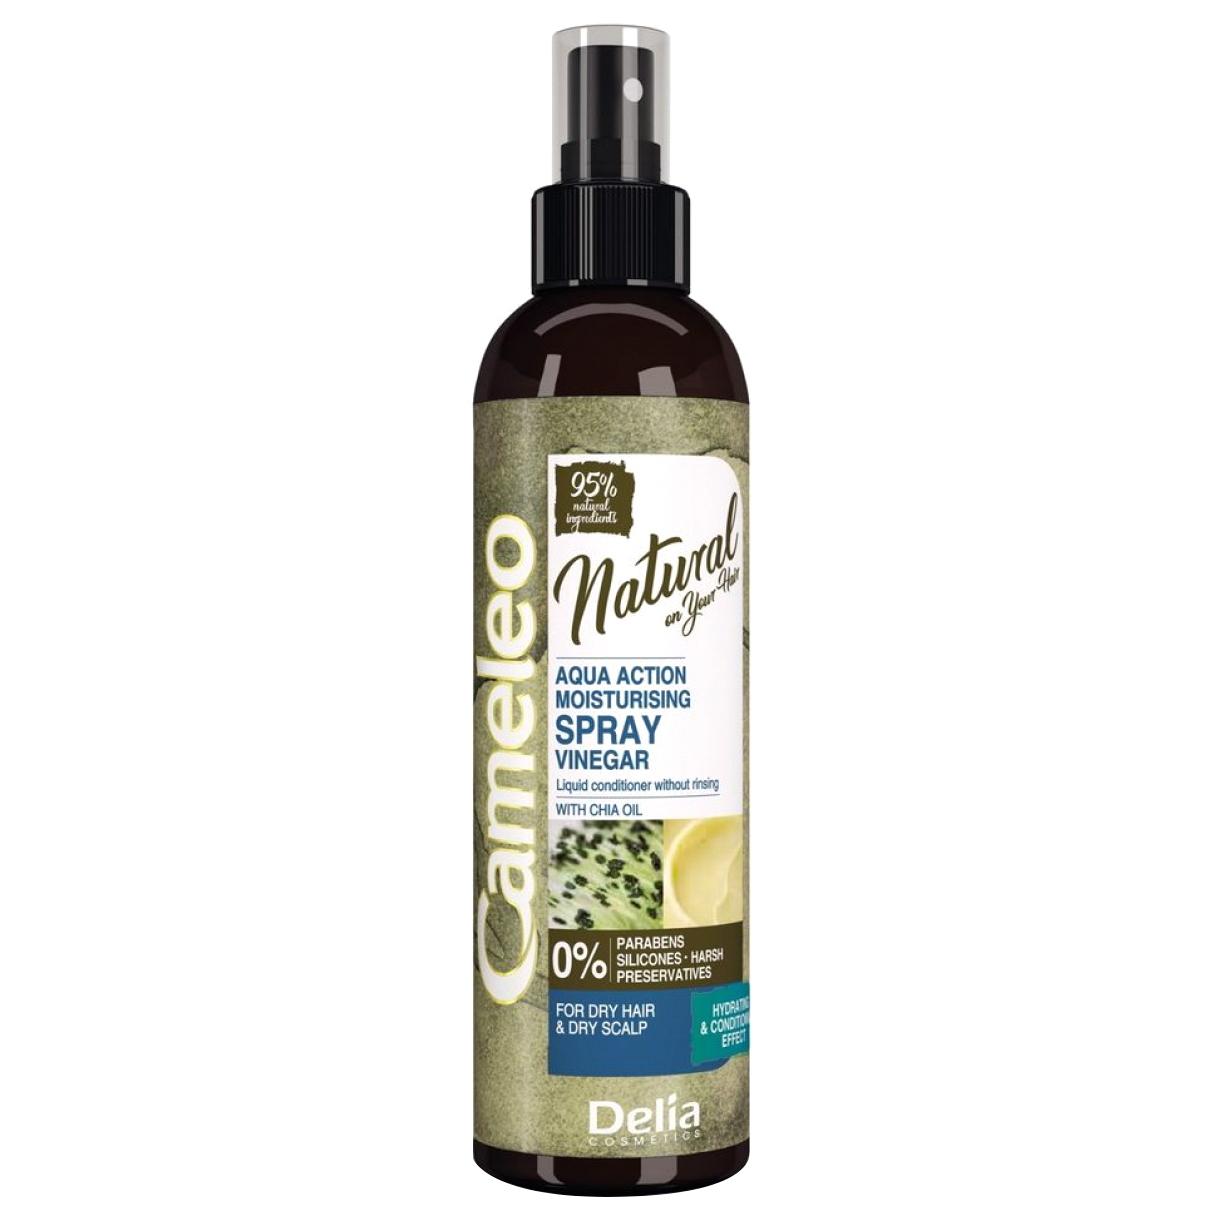 Спрей-кондиционер Delia Cosmetics Cameleo Natural On Your Hair Aqua Action с маслом чиа 200 мл кератиновый кондиционер delia cosmetics cameleo вв объем волос 200 мл